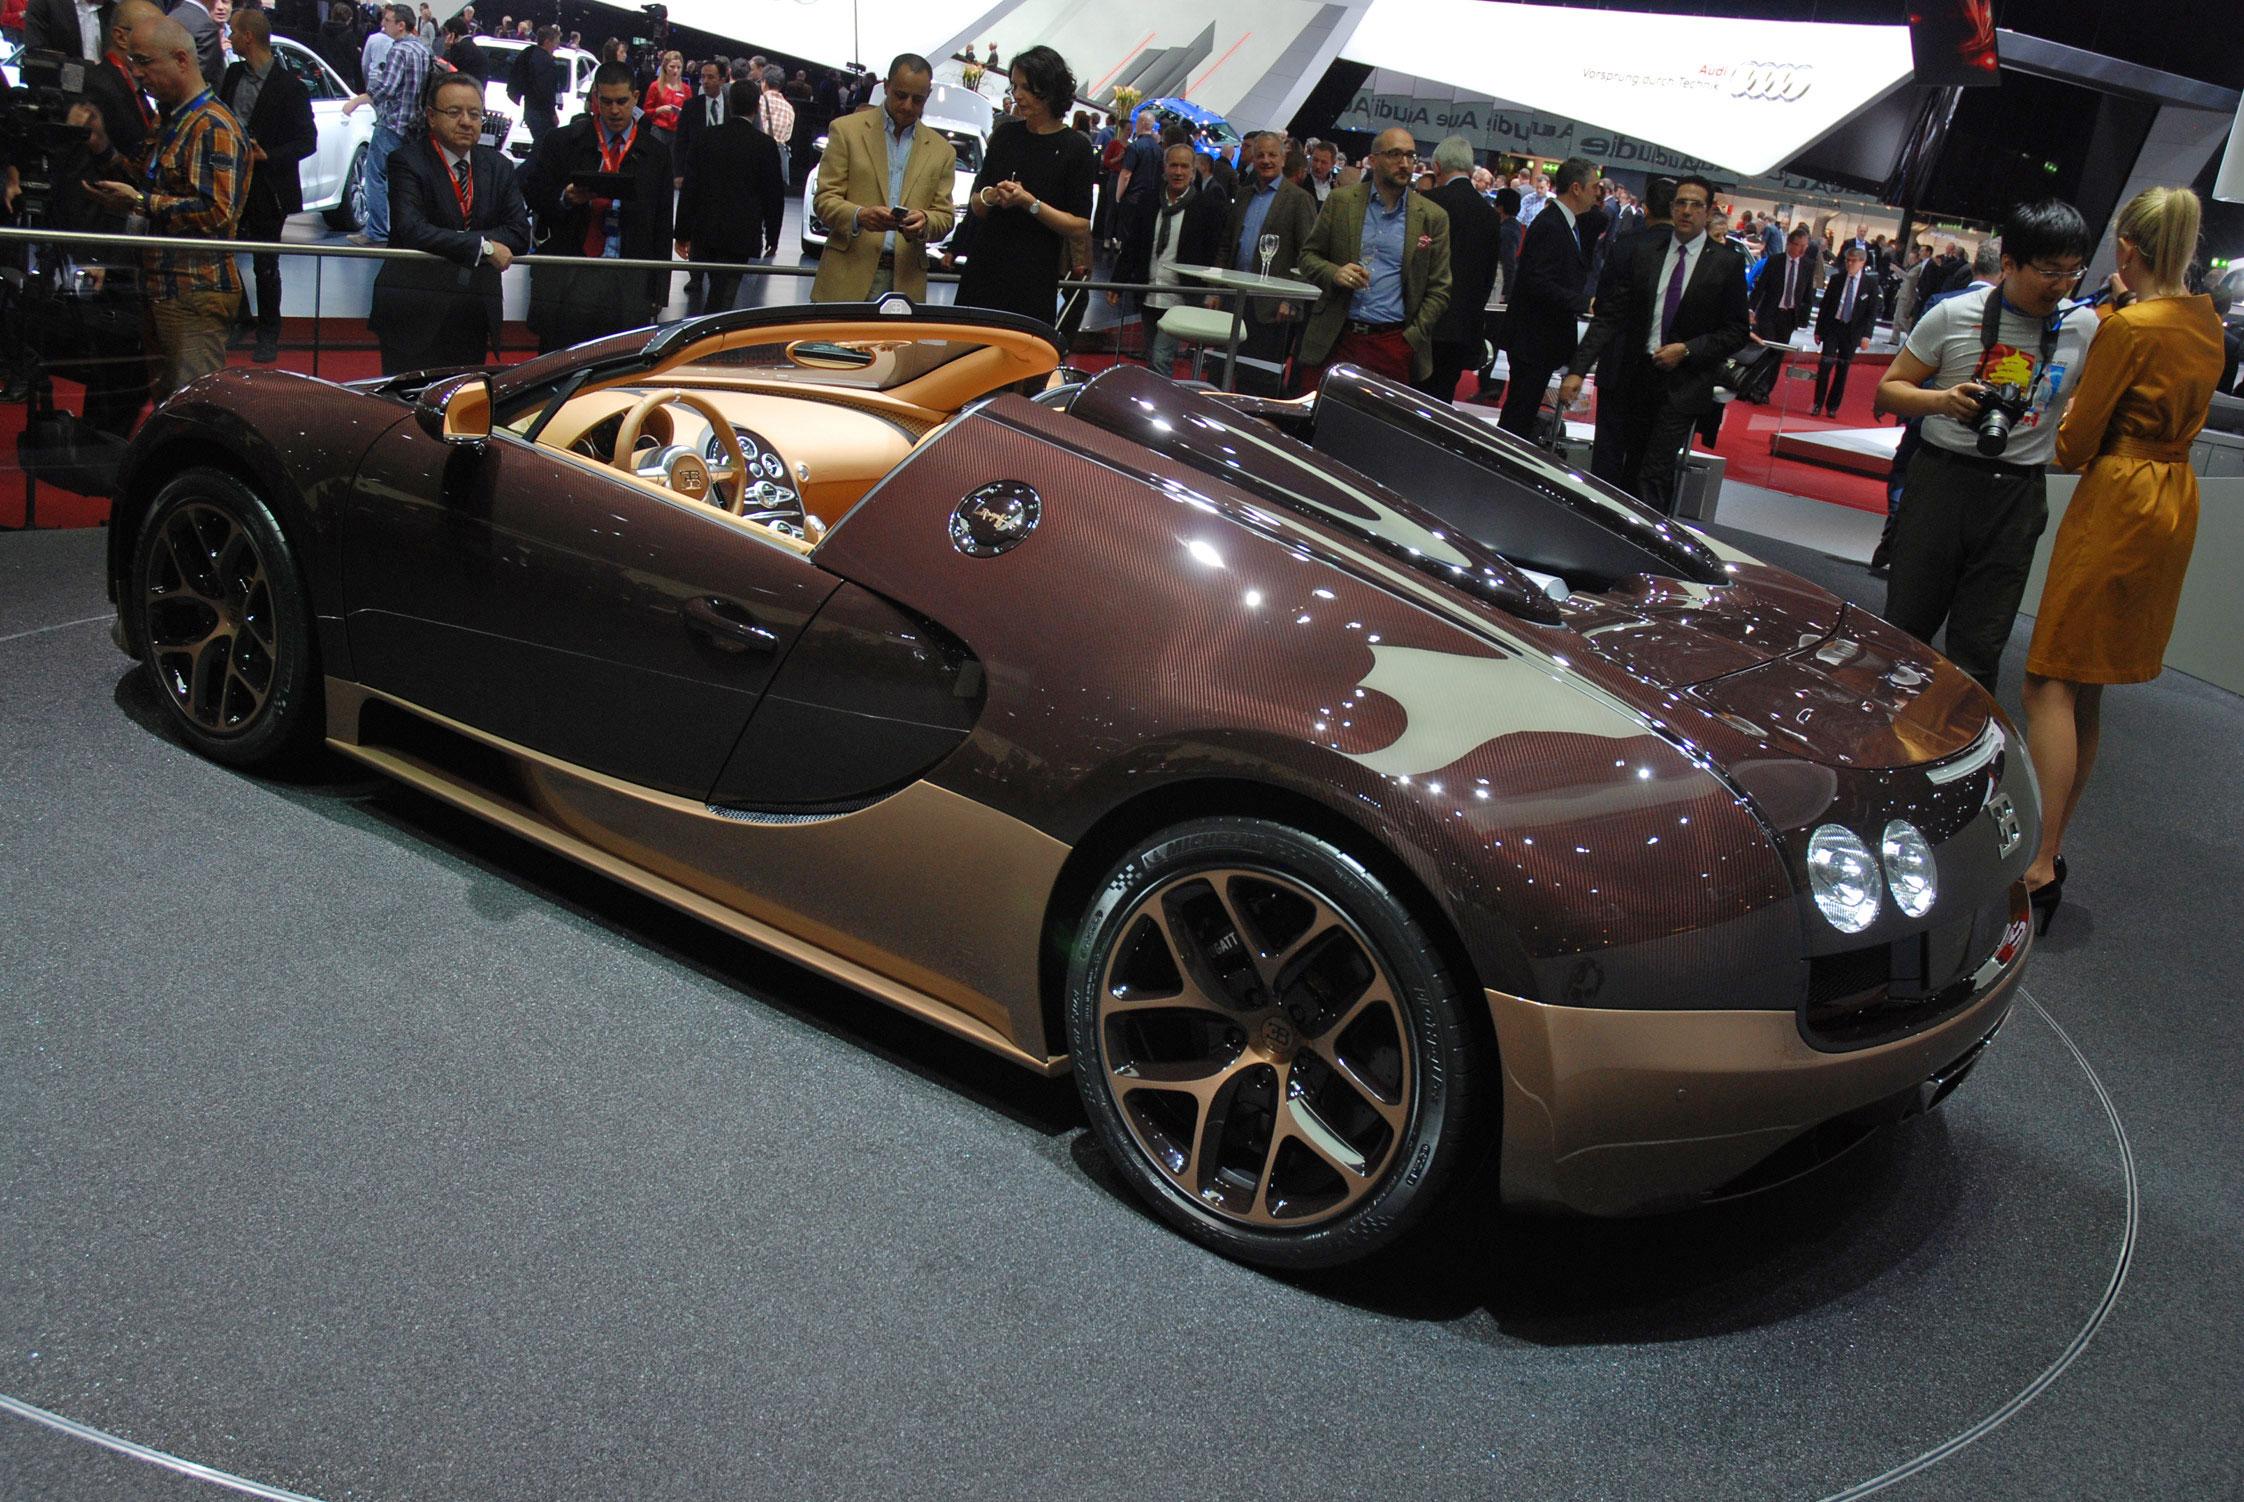 bugatti veyron 16 4 grand sport vitesse legend edition bugatti legends veyron 16 4 grand sport. Black Bedroom Furniture Sets. Home Design Ideas